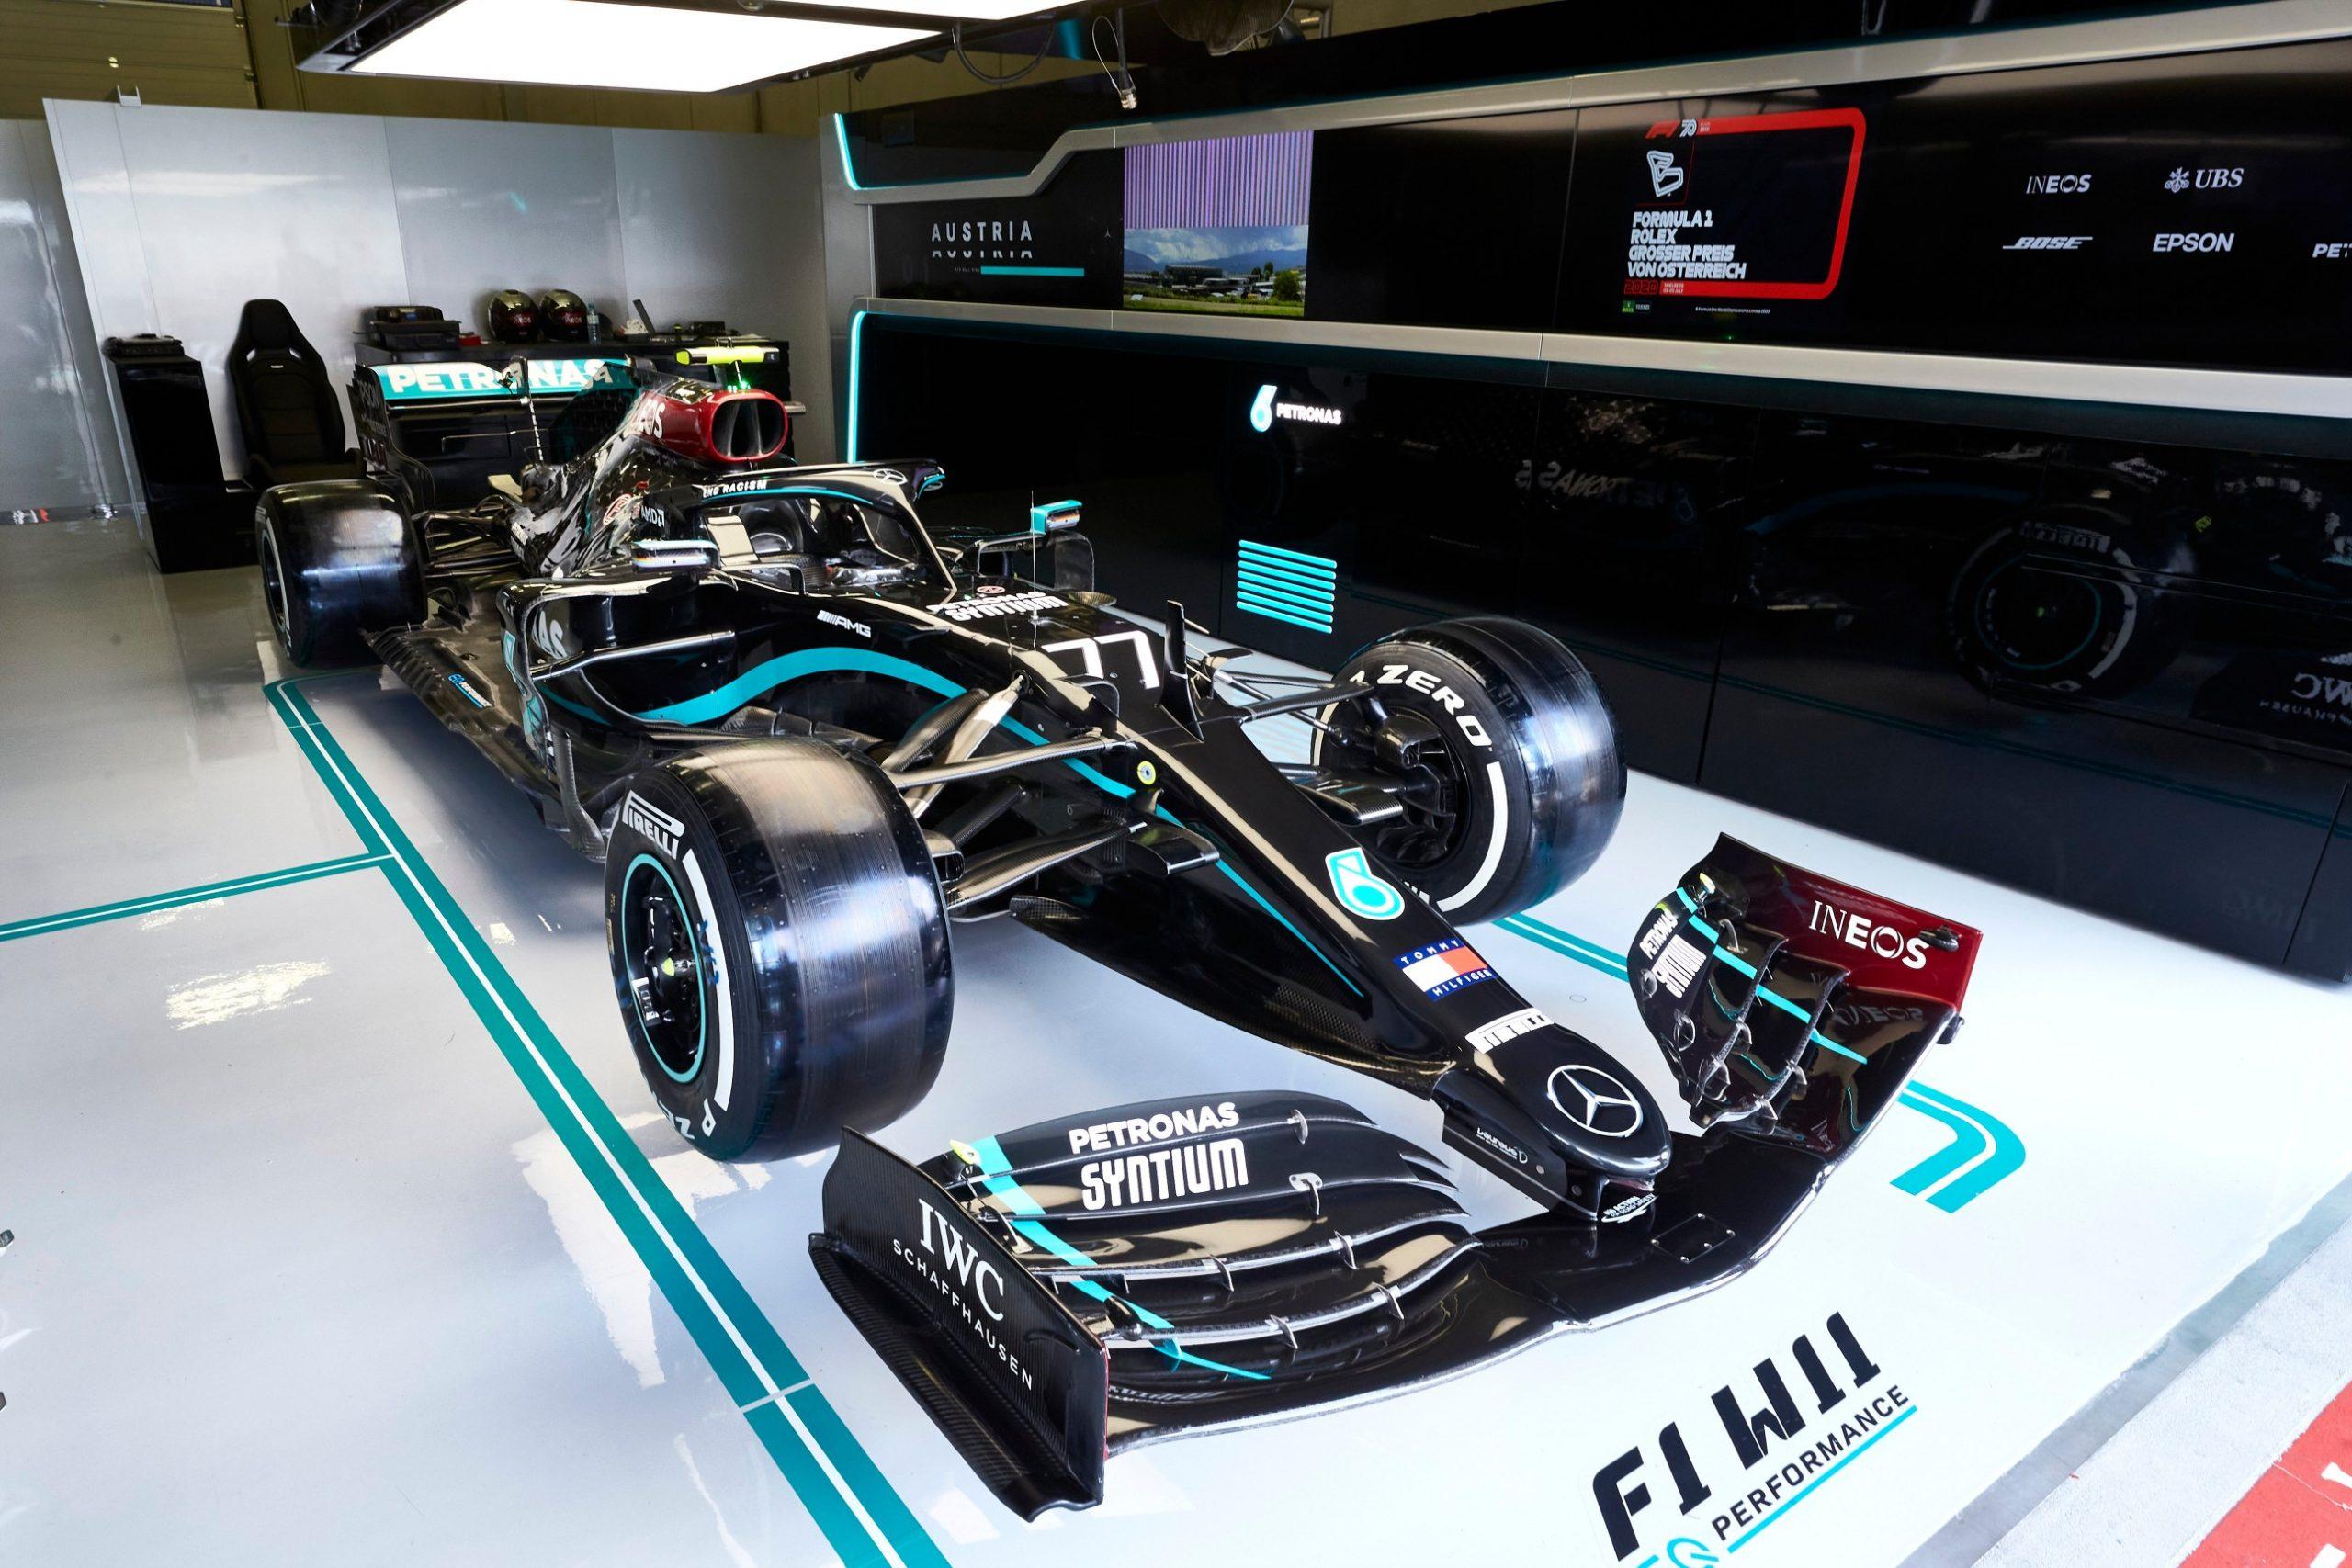 Puma Lewis Hamilton Mercedes